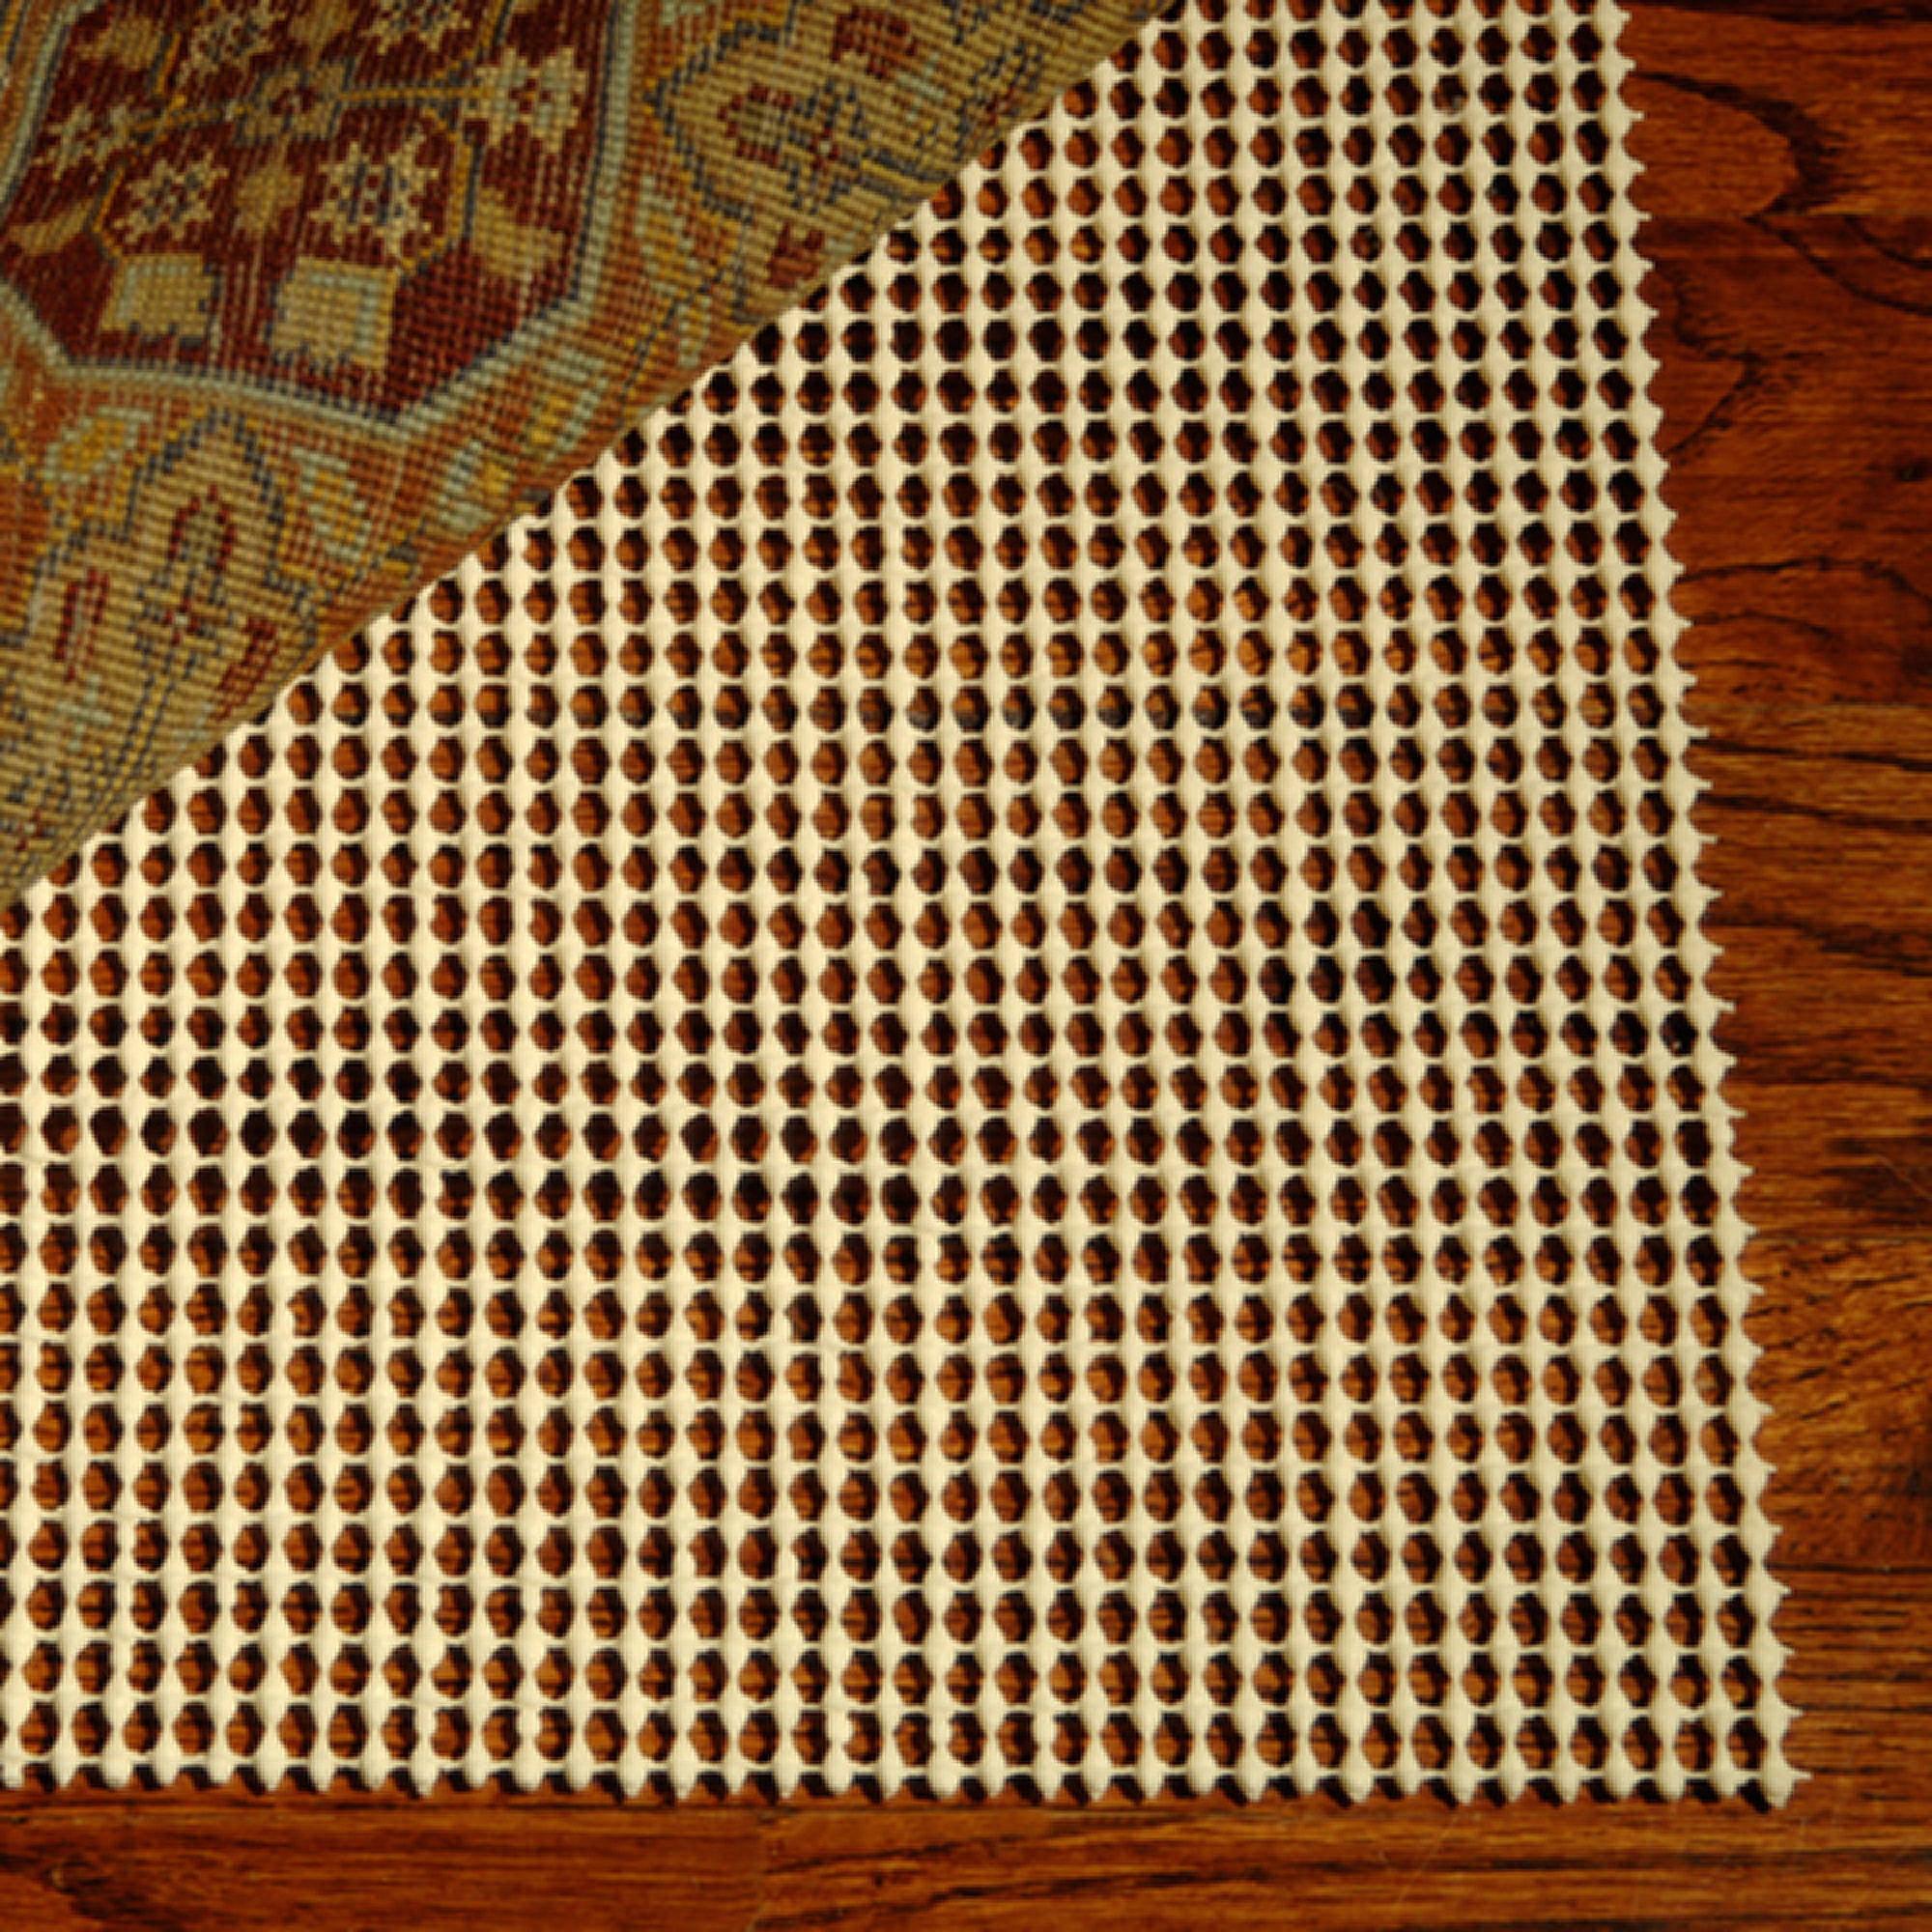 safavieh upgraded area rug pad for hard floor - walmart